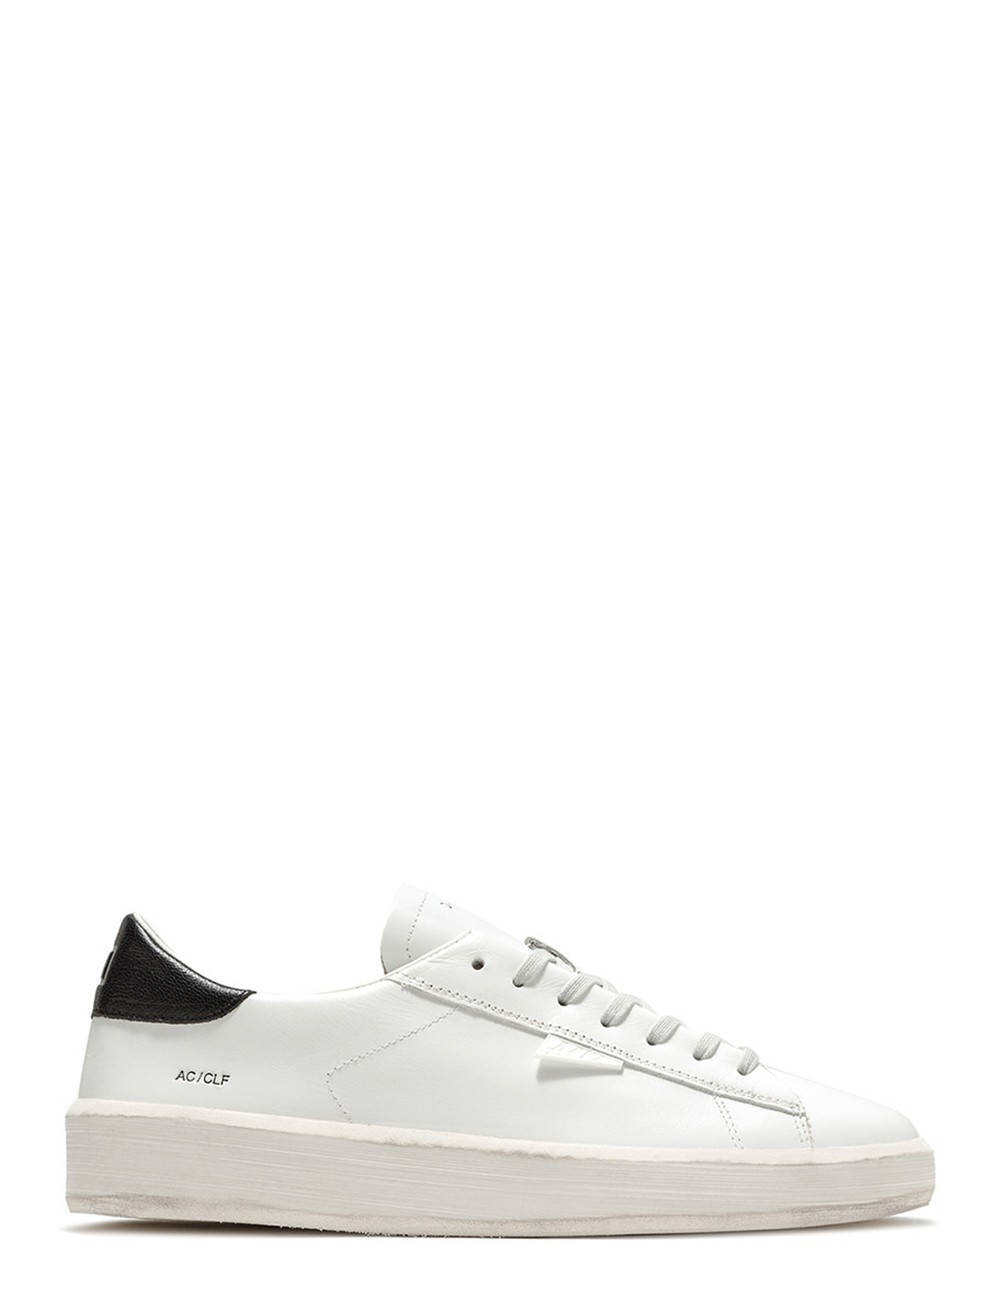 Sneakers Ace Calf White Black